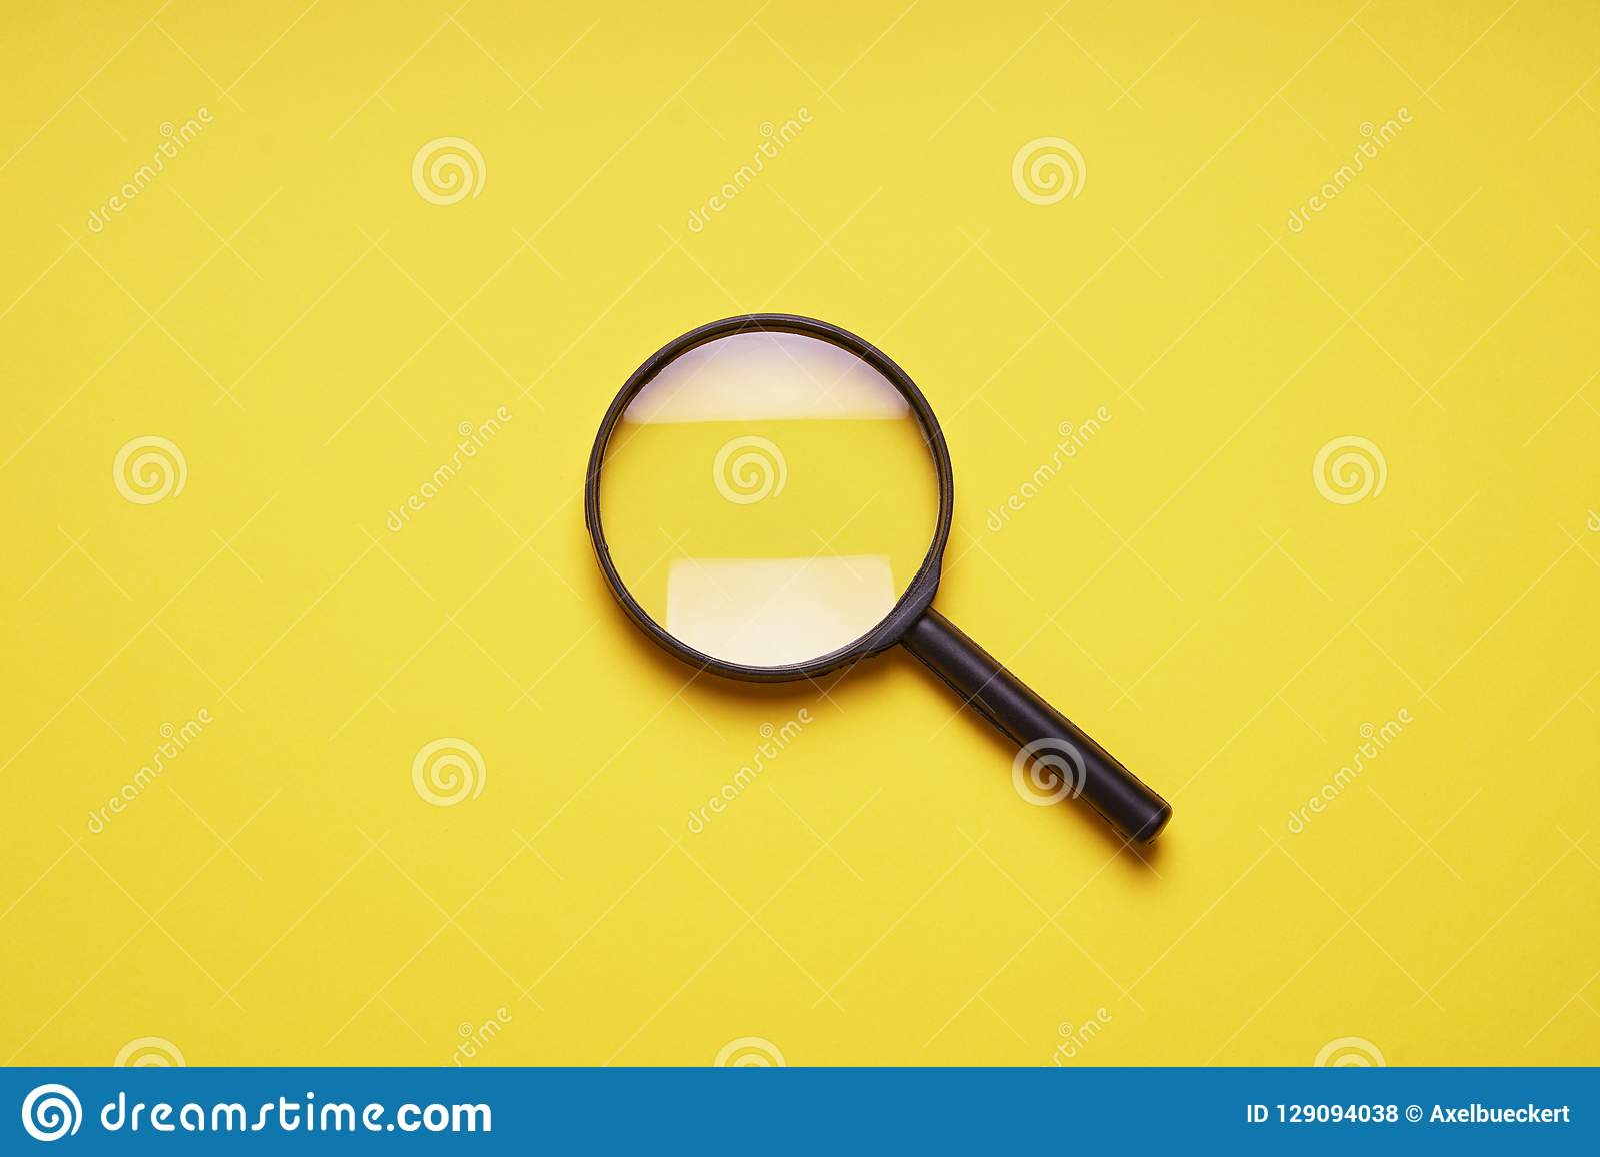 Símbolo da busca da lupa da lente de aumento da lupa